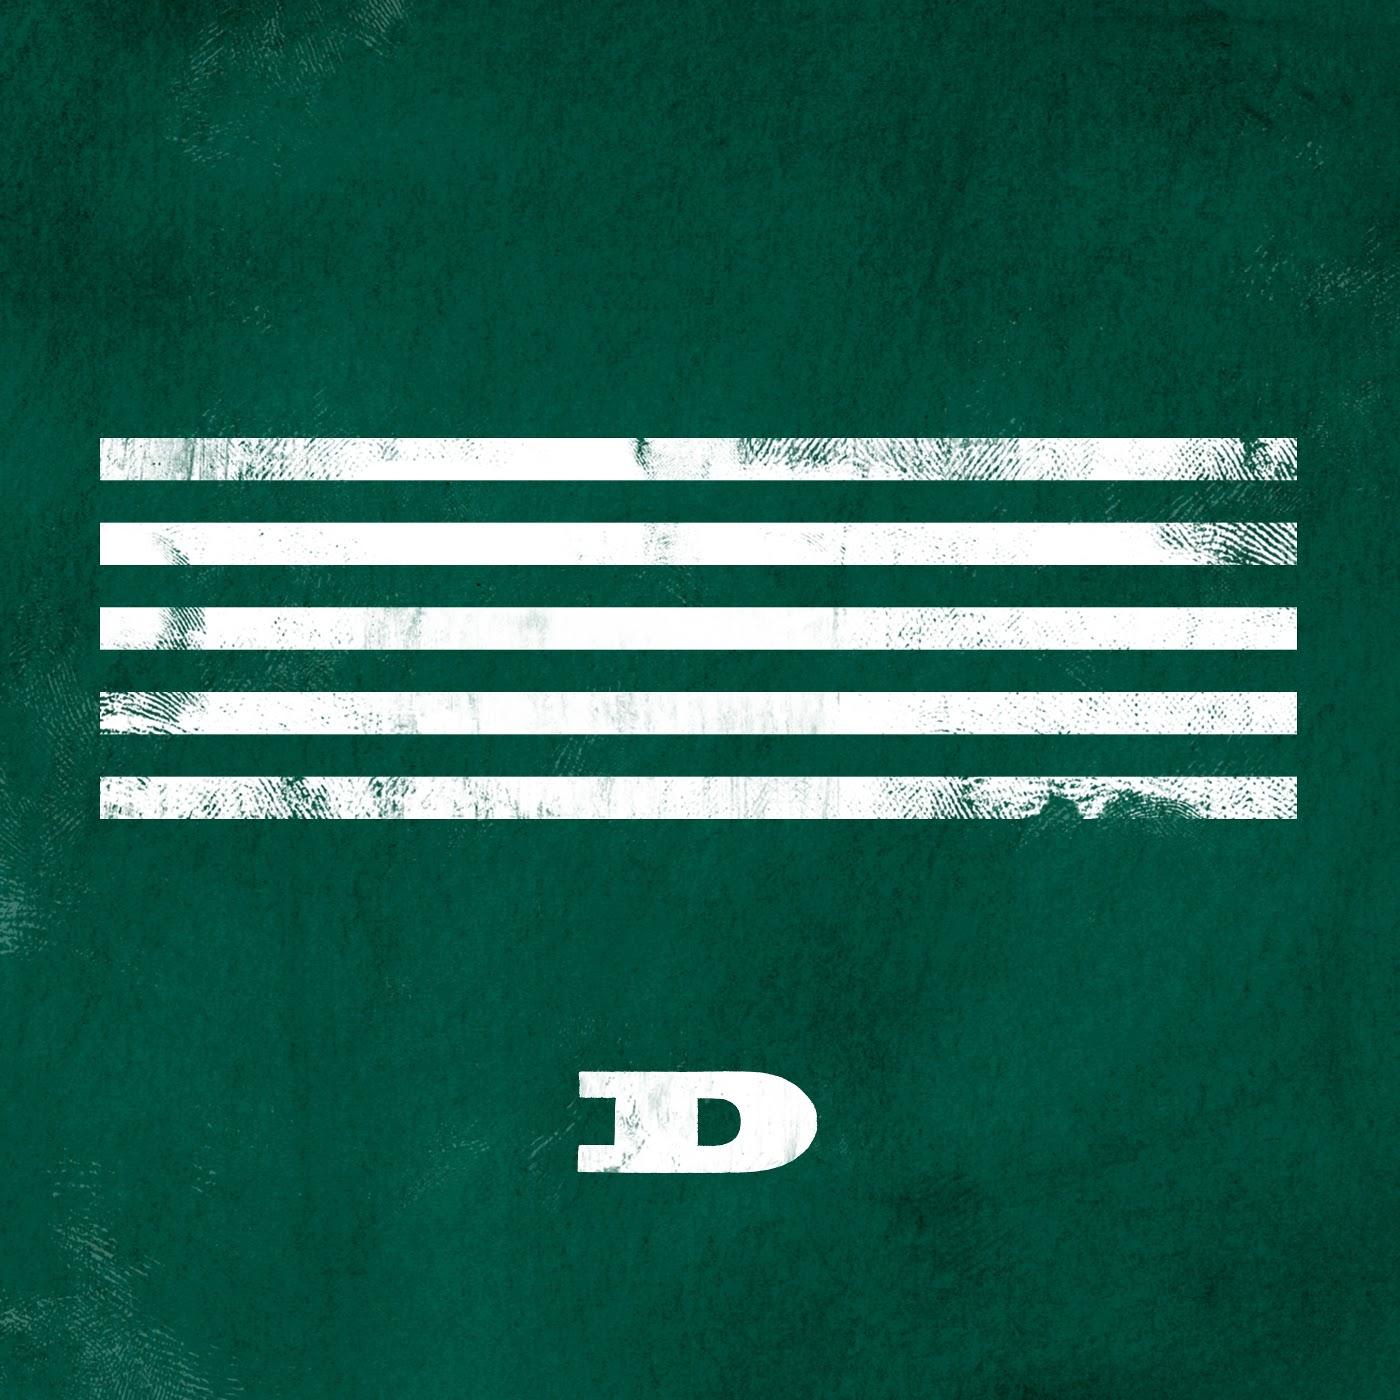 BIGBANG_D_digital_cover_art